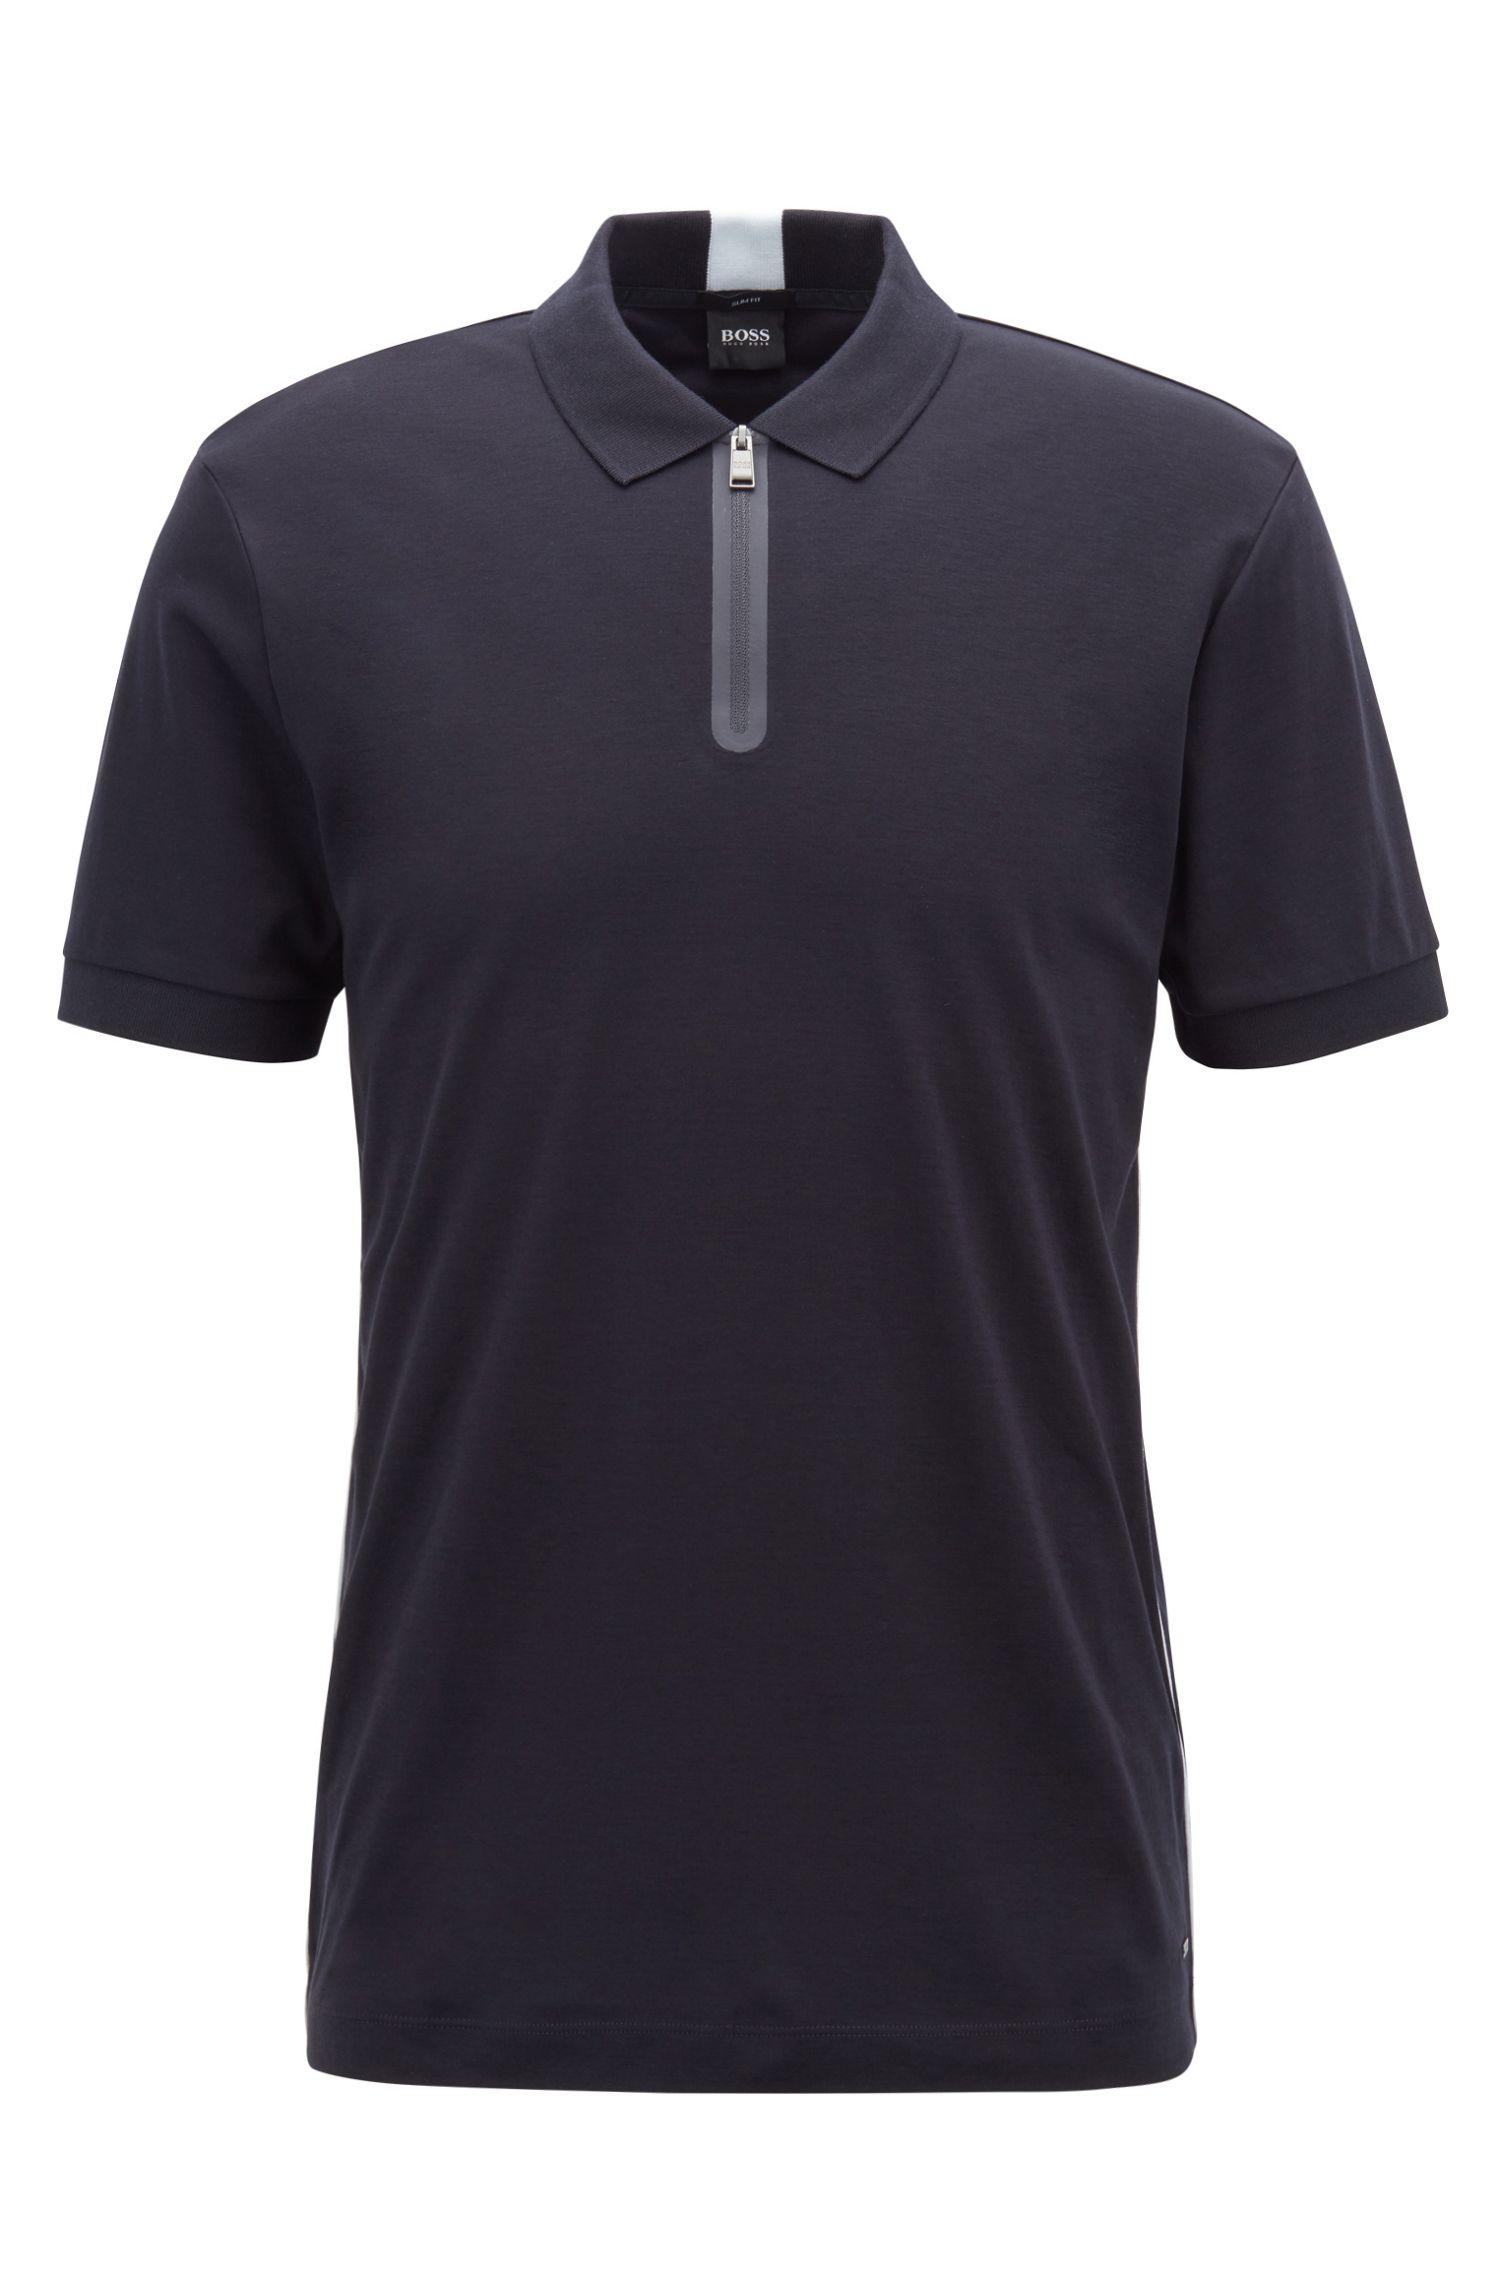 Poloshirt aus Baumwolle mit Reißverschluss am Ausschnitt, Dunkelblau